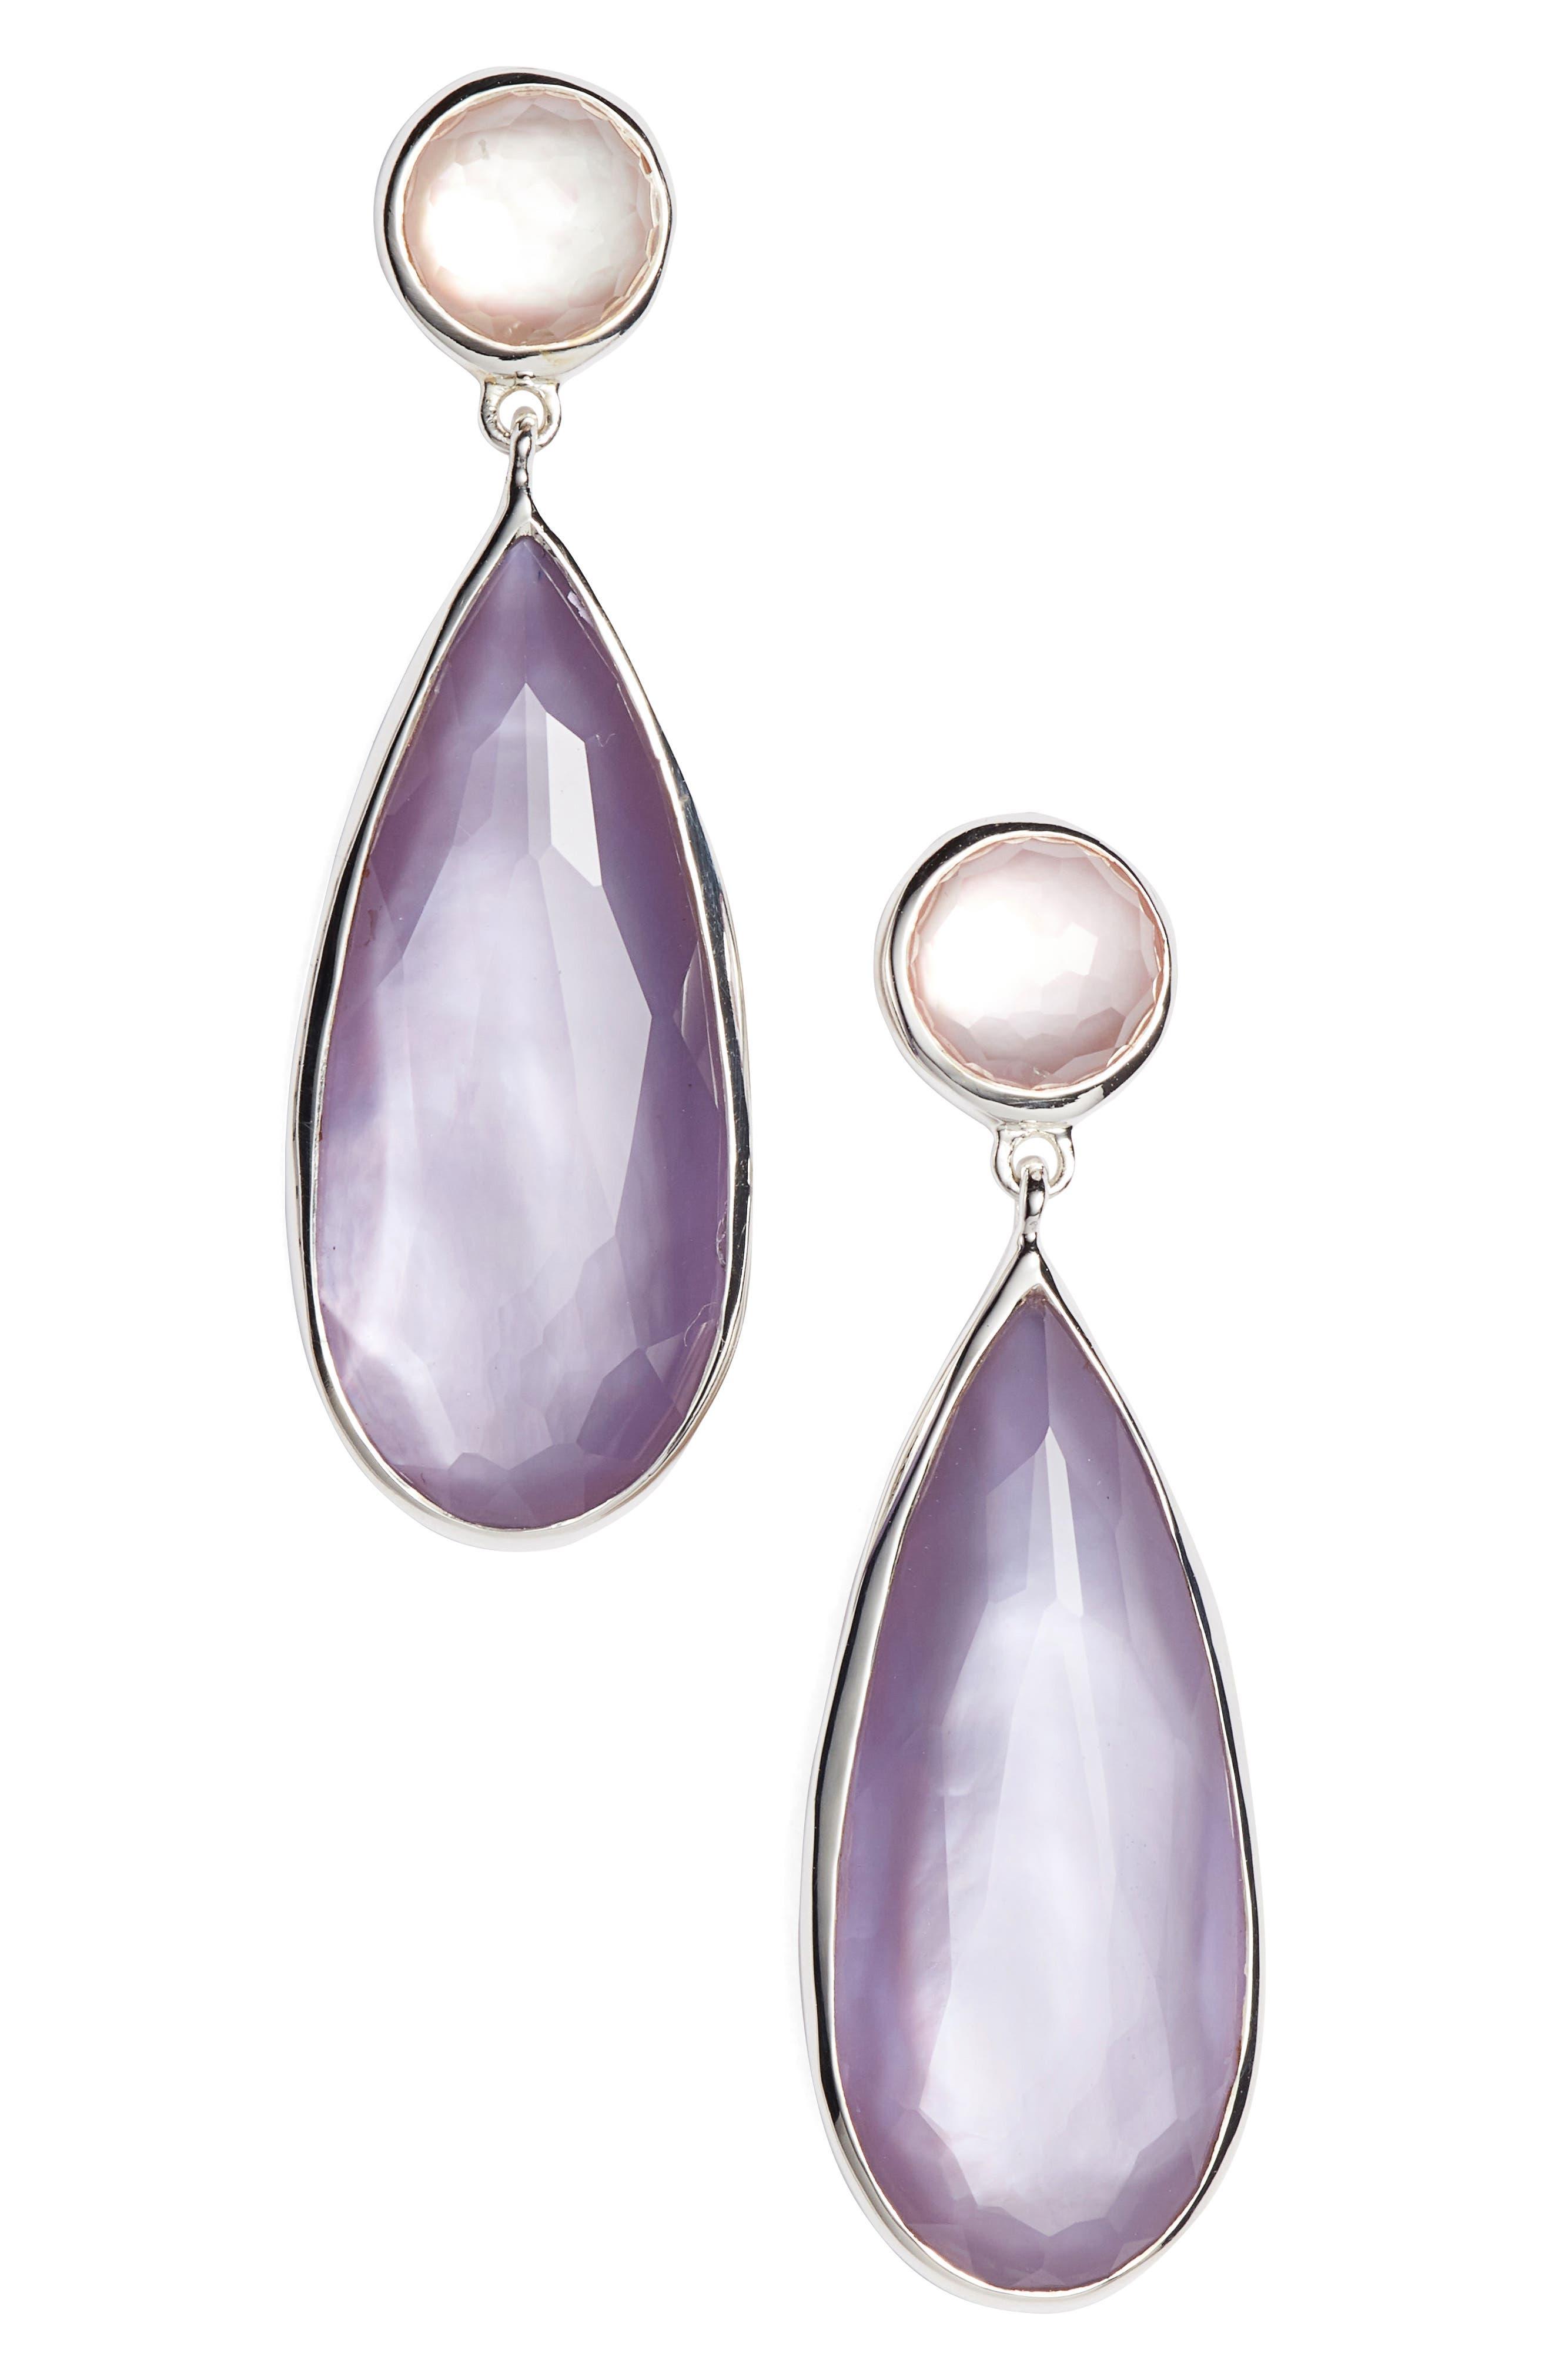 Wonderland Teardrop Earrings,                             Main thumbnail 1, color,                             Silver/ Primrose